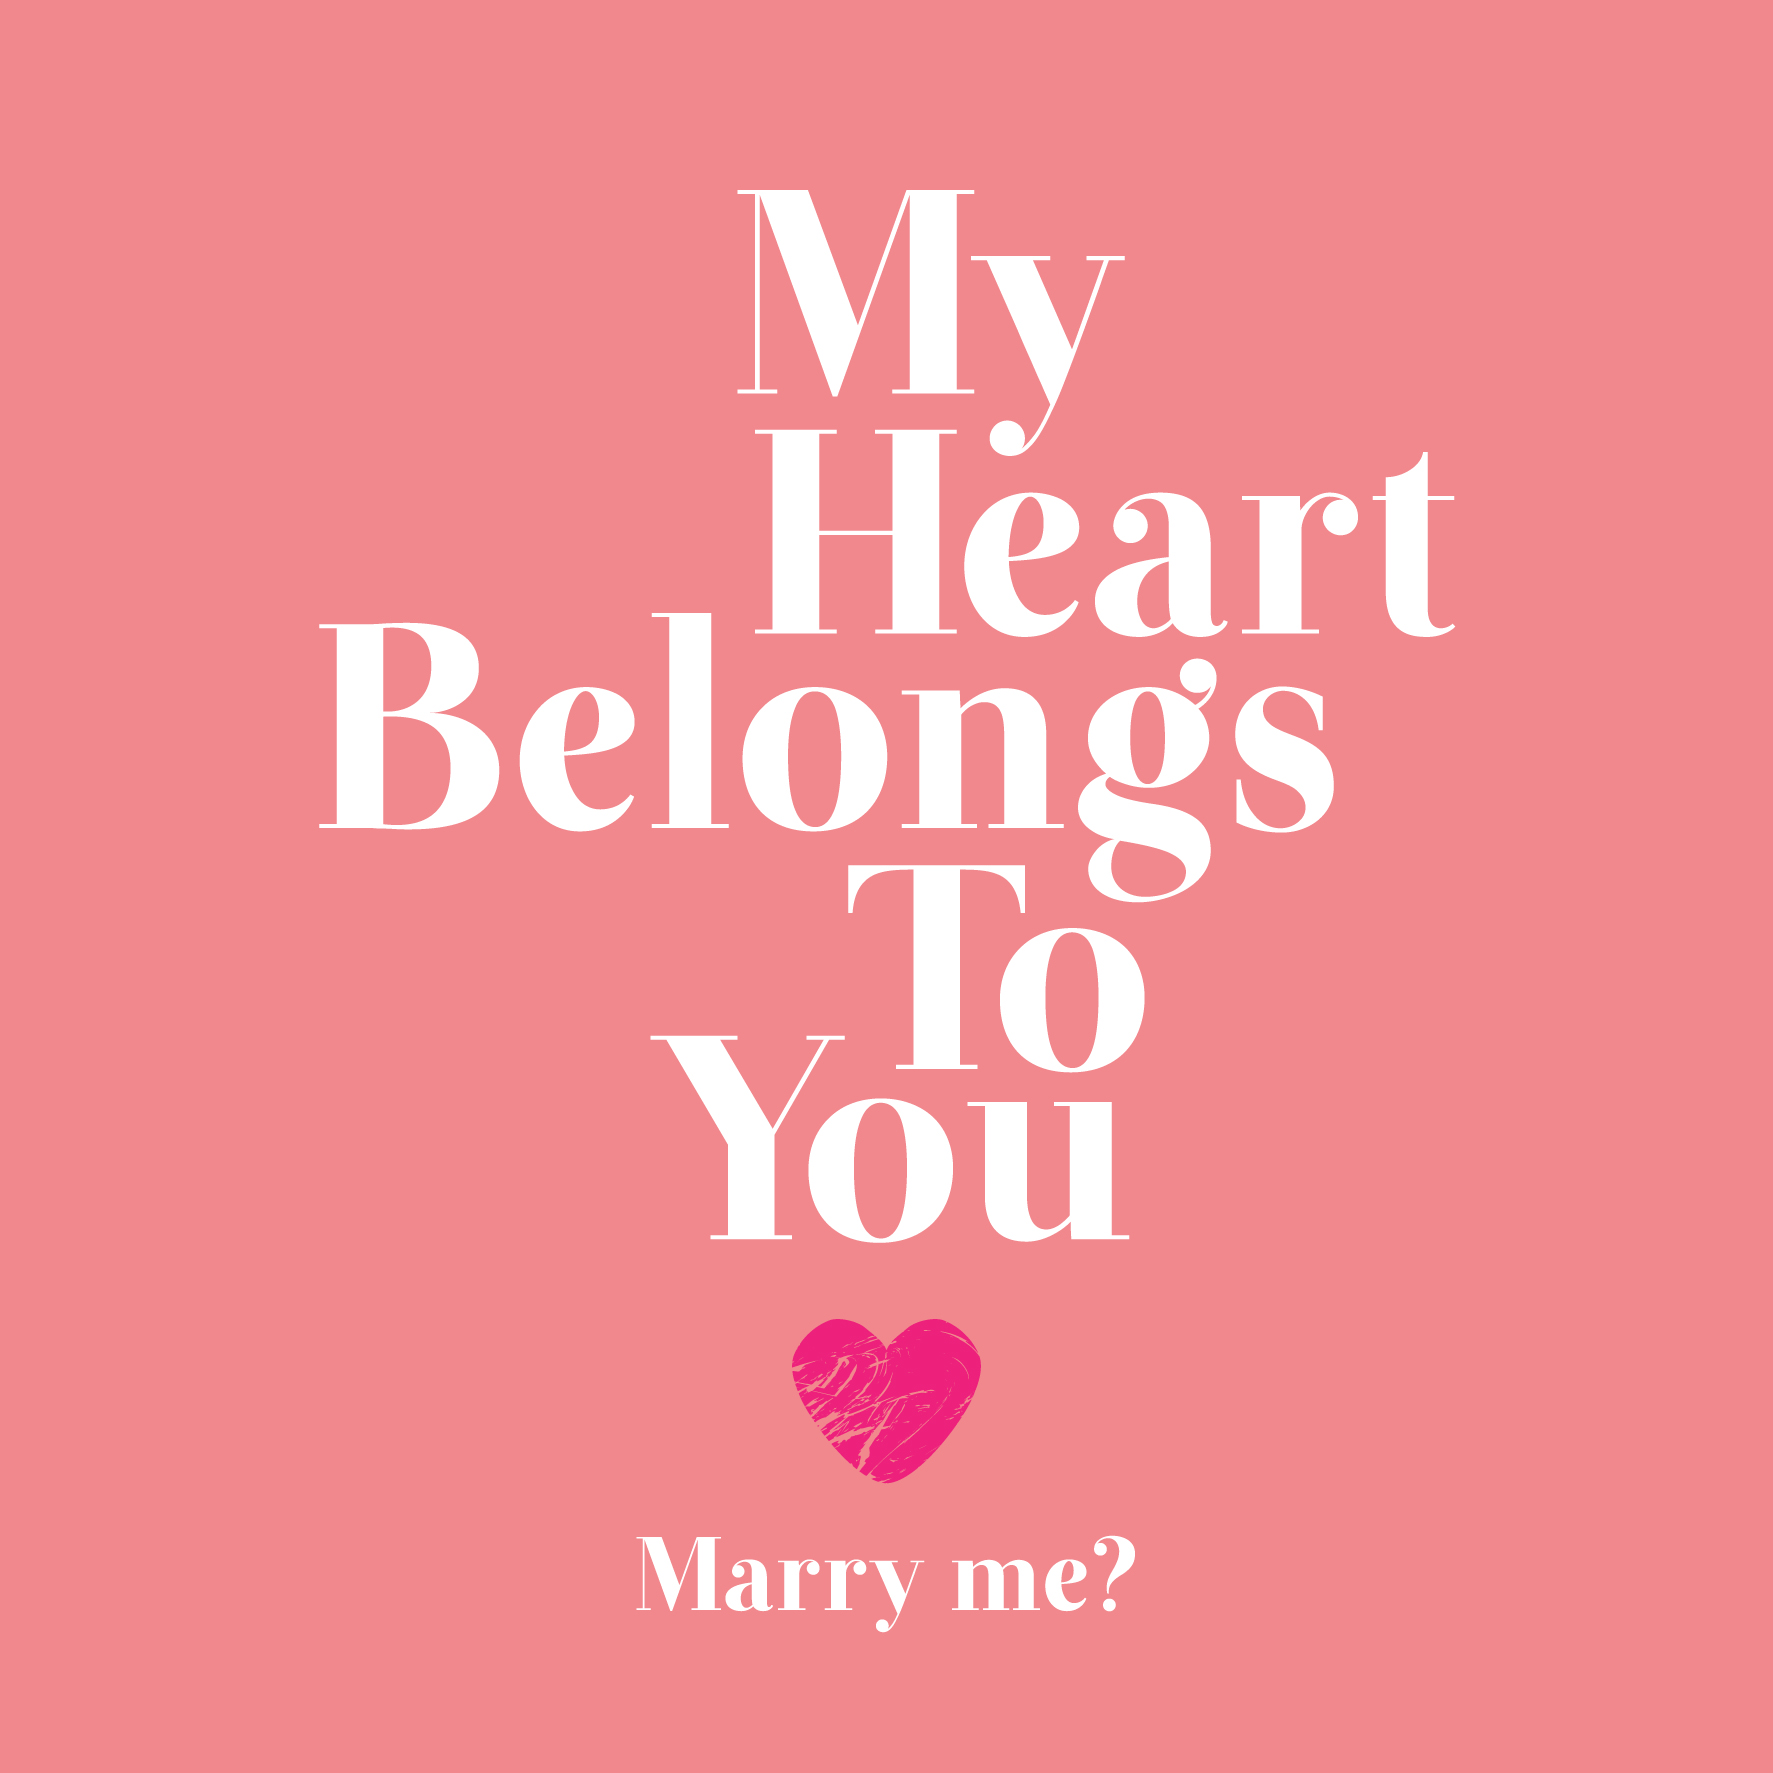 Boy Proposing Girl Hd Wallpaper 30 Wonderful Marry Me Images